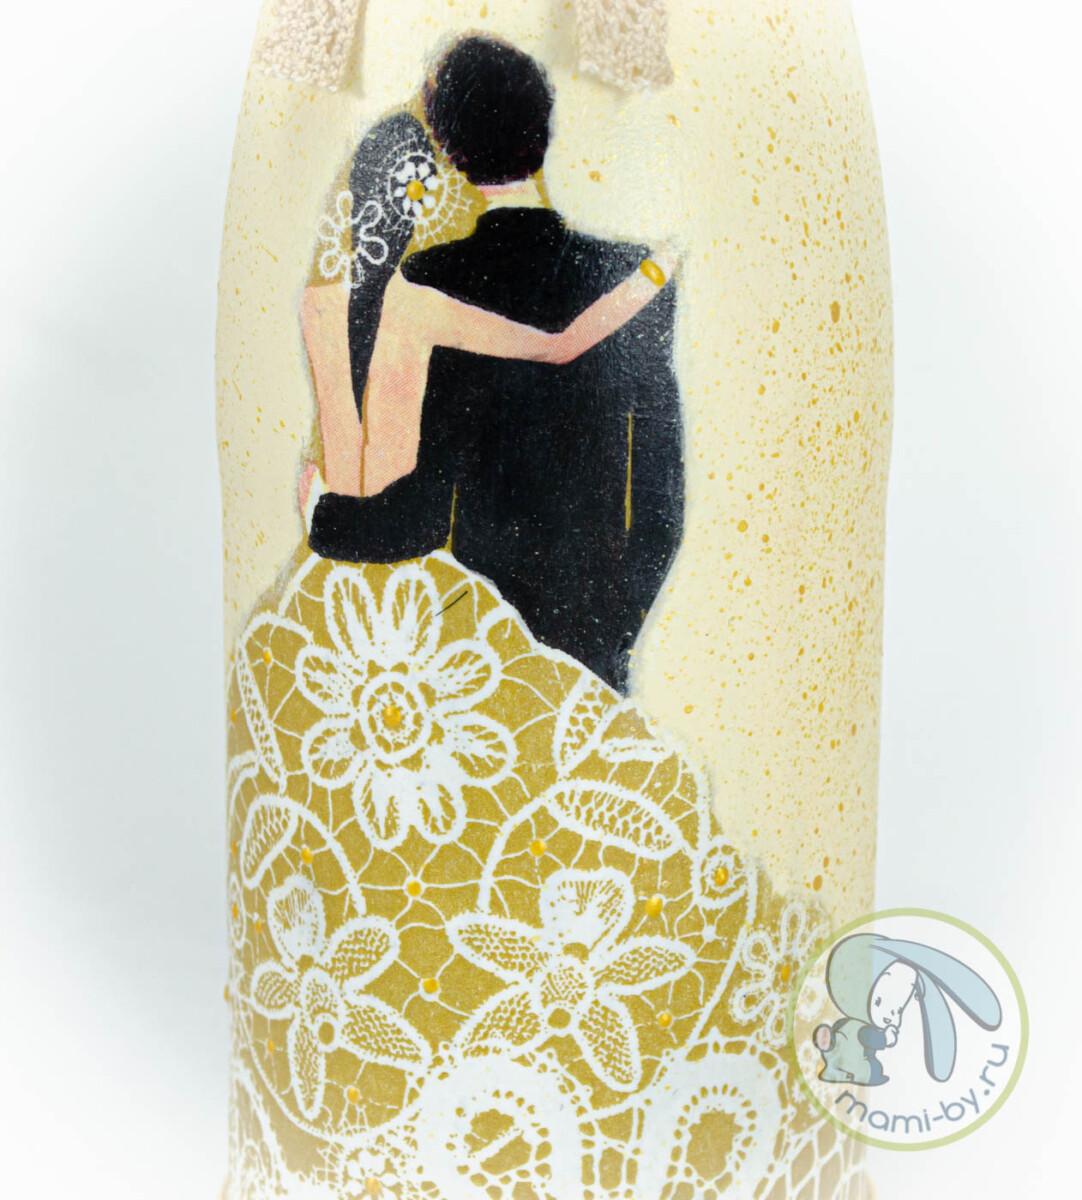 dekupazh-4 Декупаж хобби свадьба рукоделие праздники подарки Новый год декупаж декор